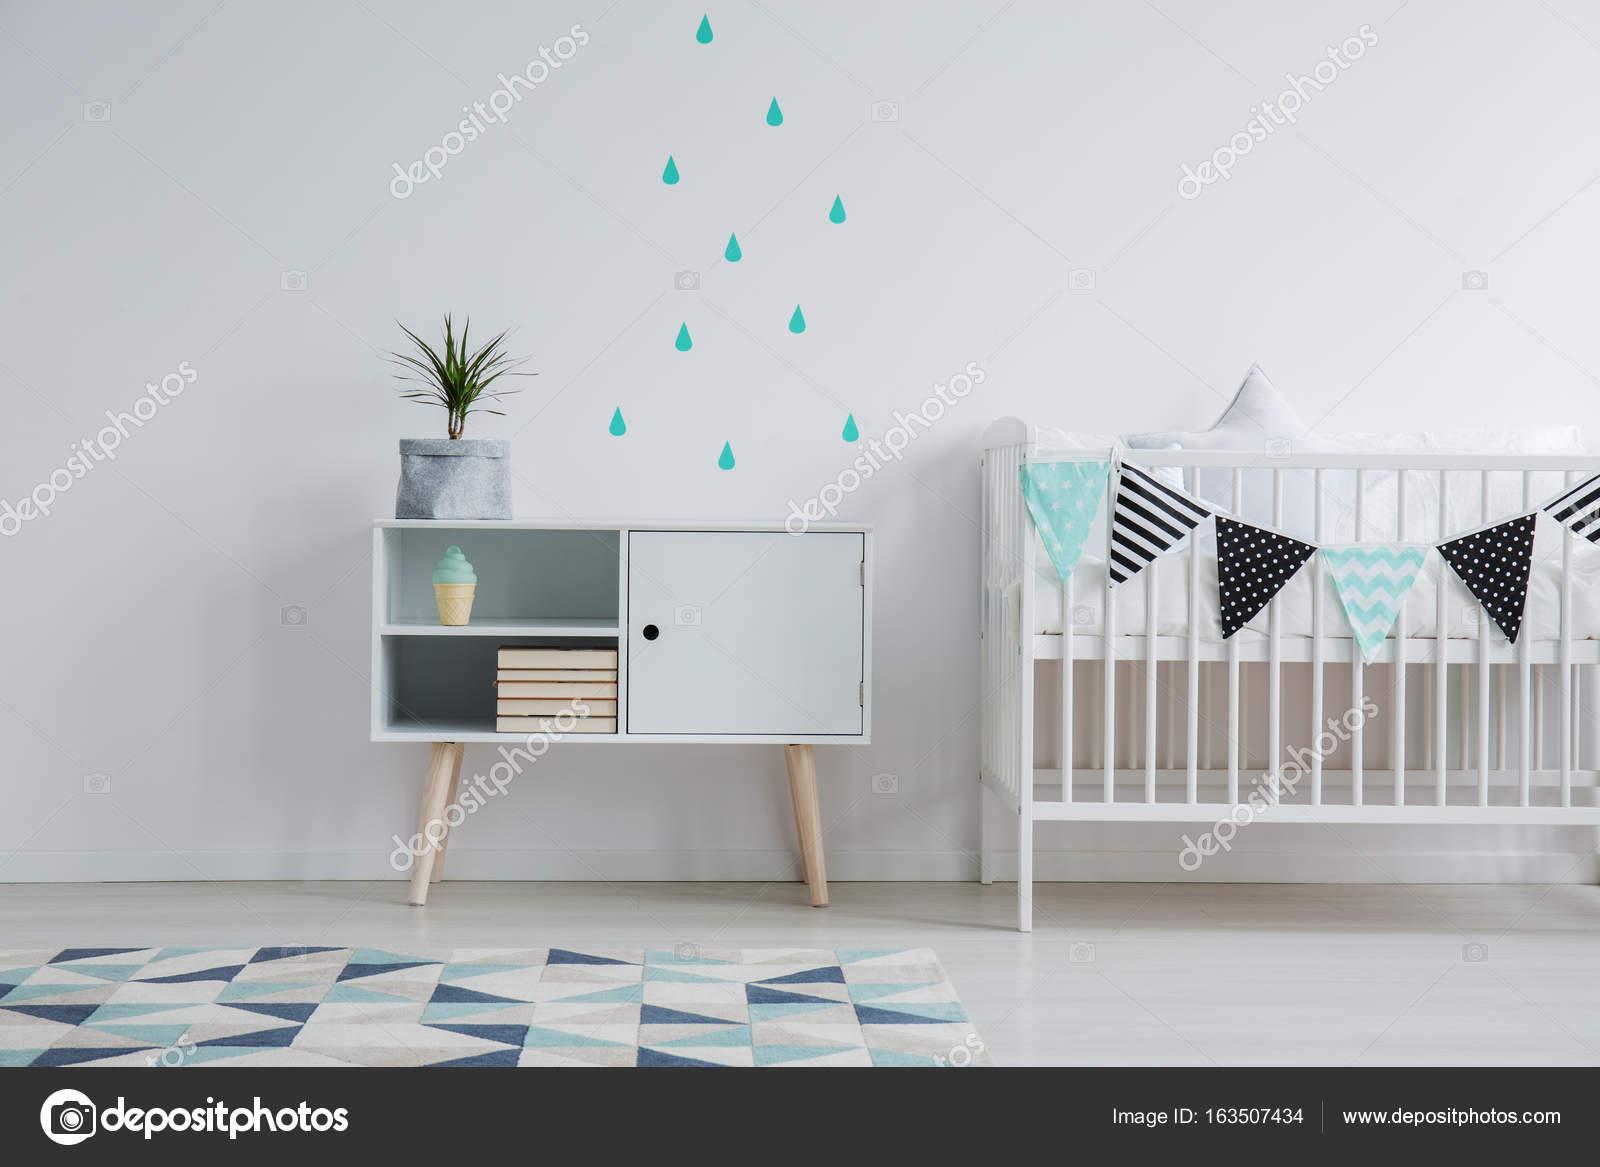 Planten Slaapkamer Baby : Mint waterdruppel stickers u2014 stockfoto © photographee.eu #163507434